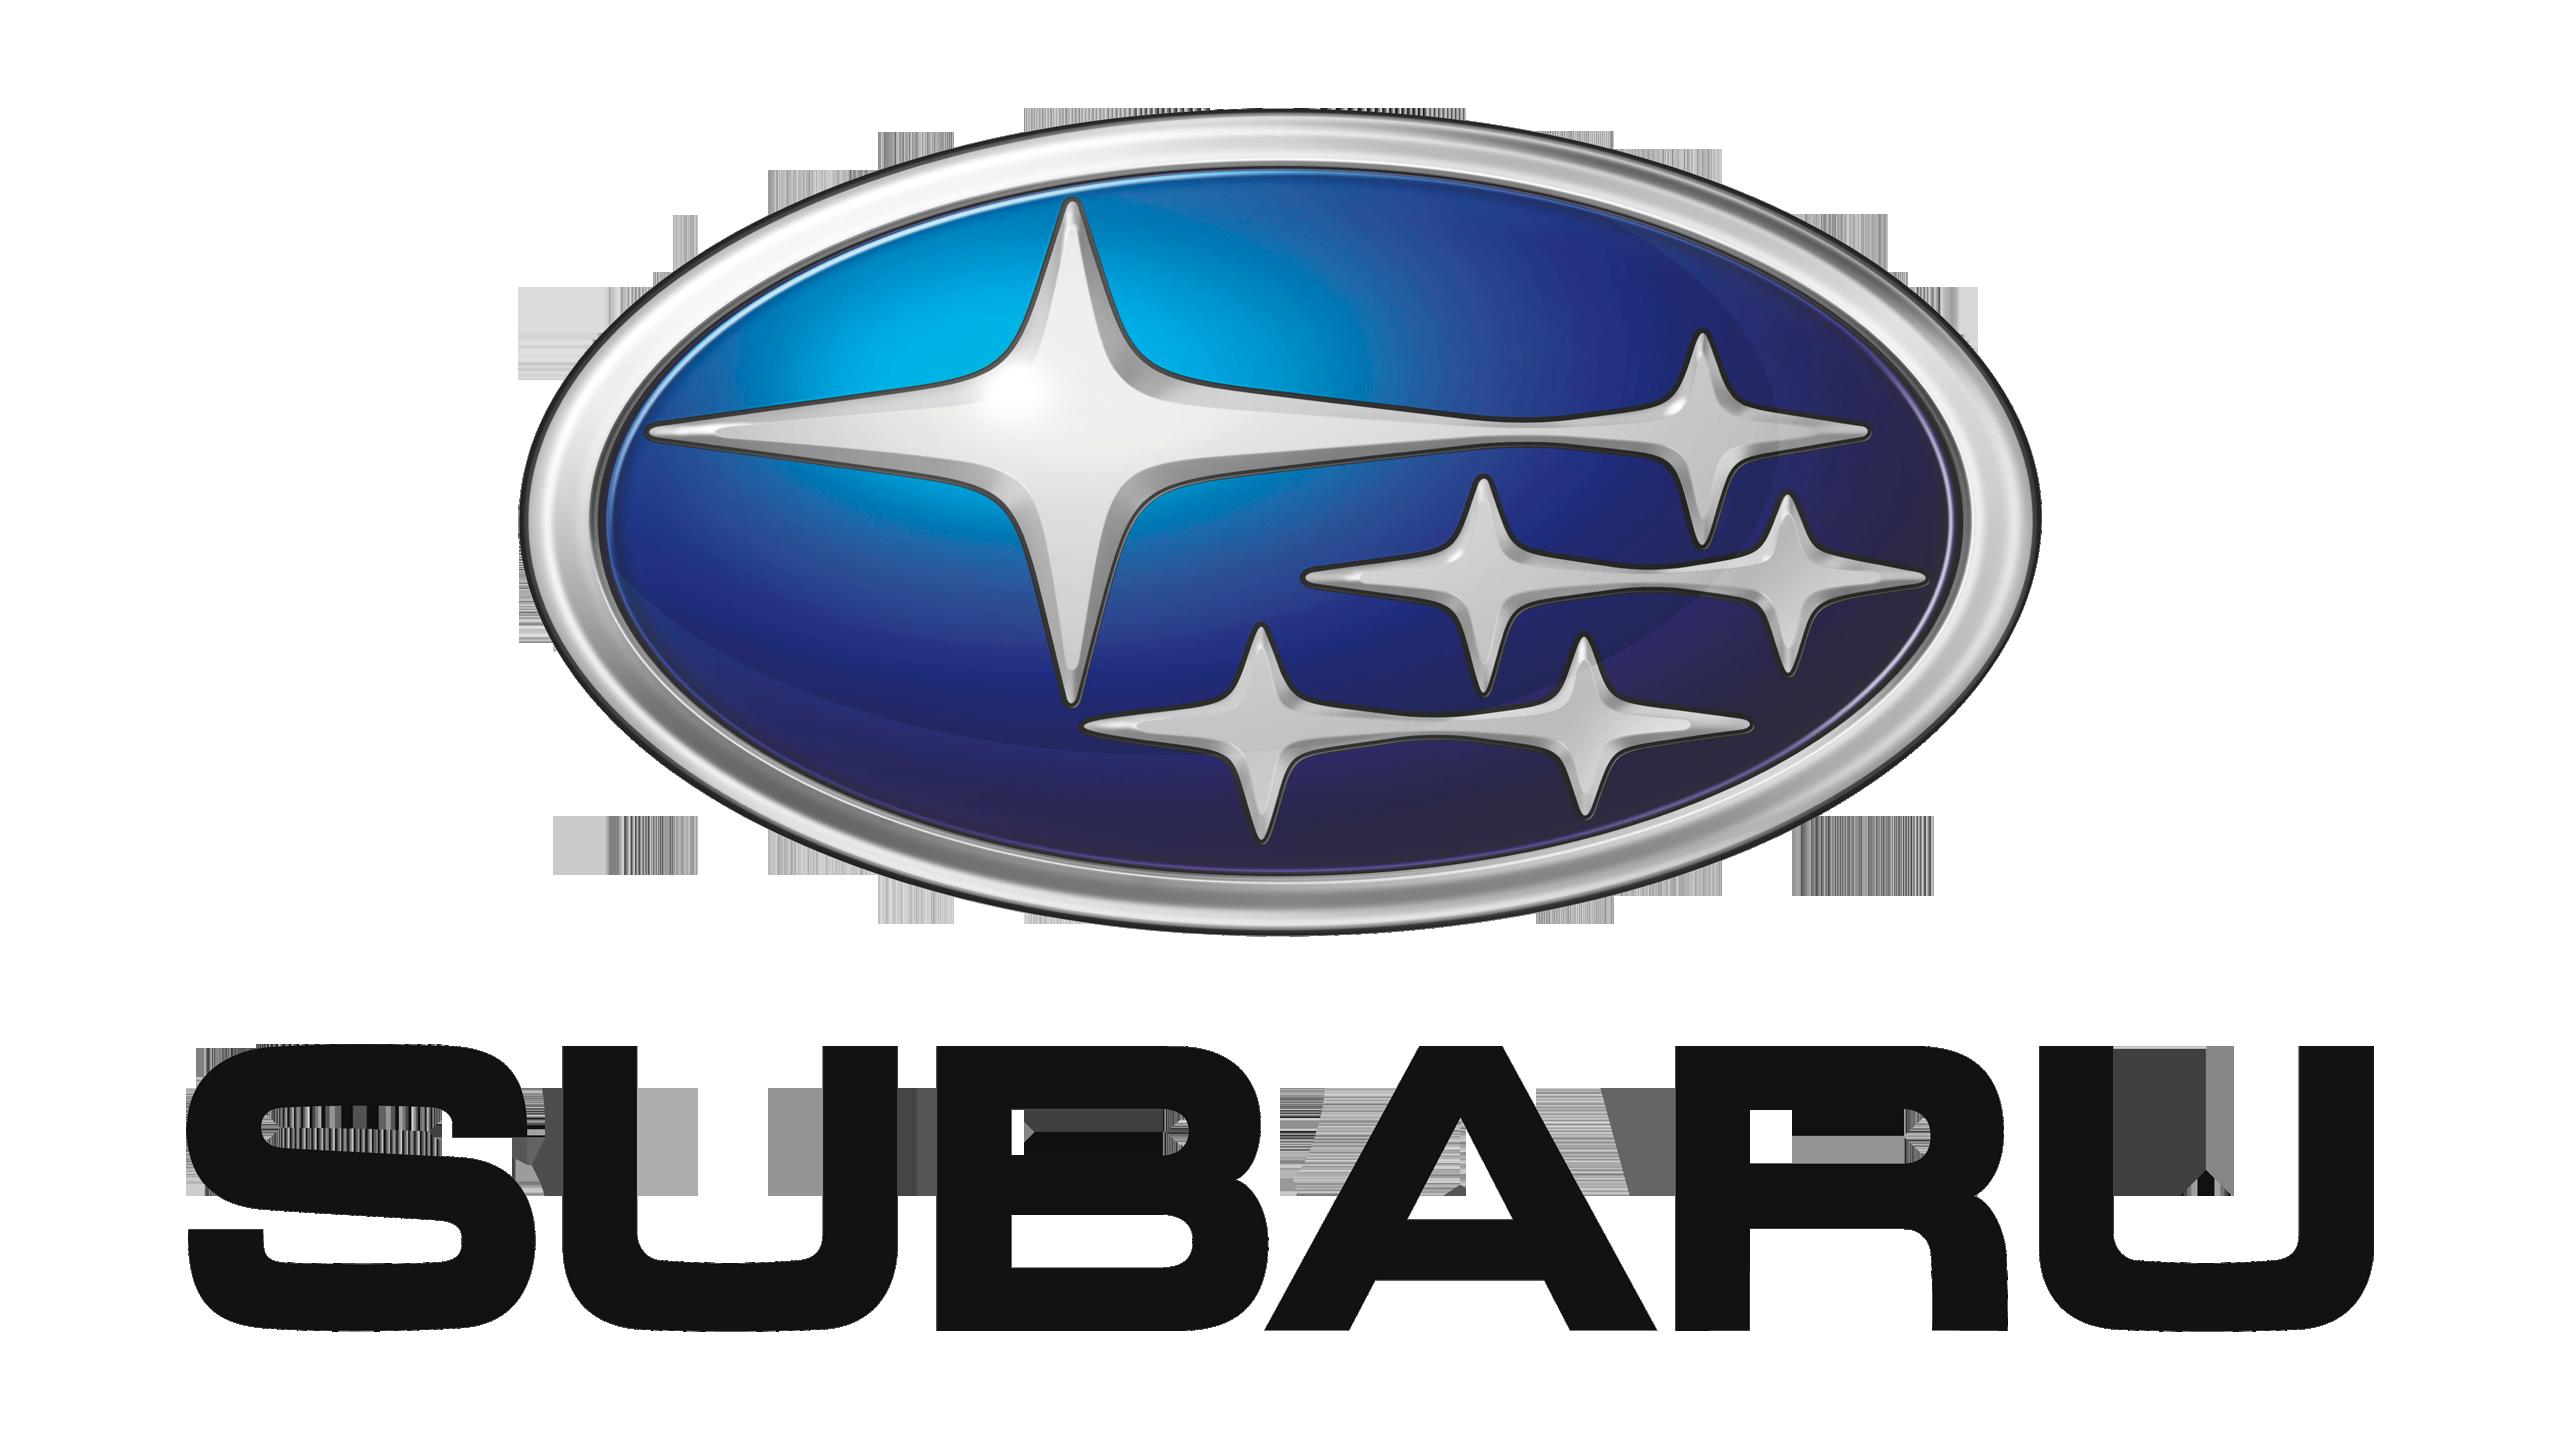 Subaru Logo (2003-Present) 2560x1440 HD png - Subaru PNG